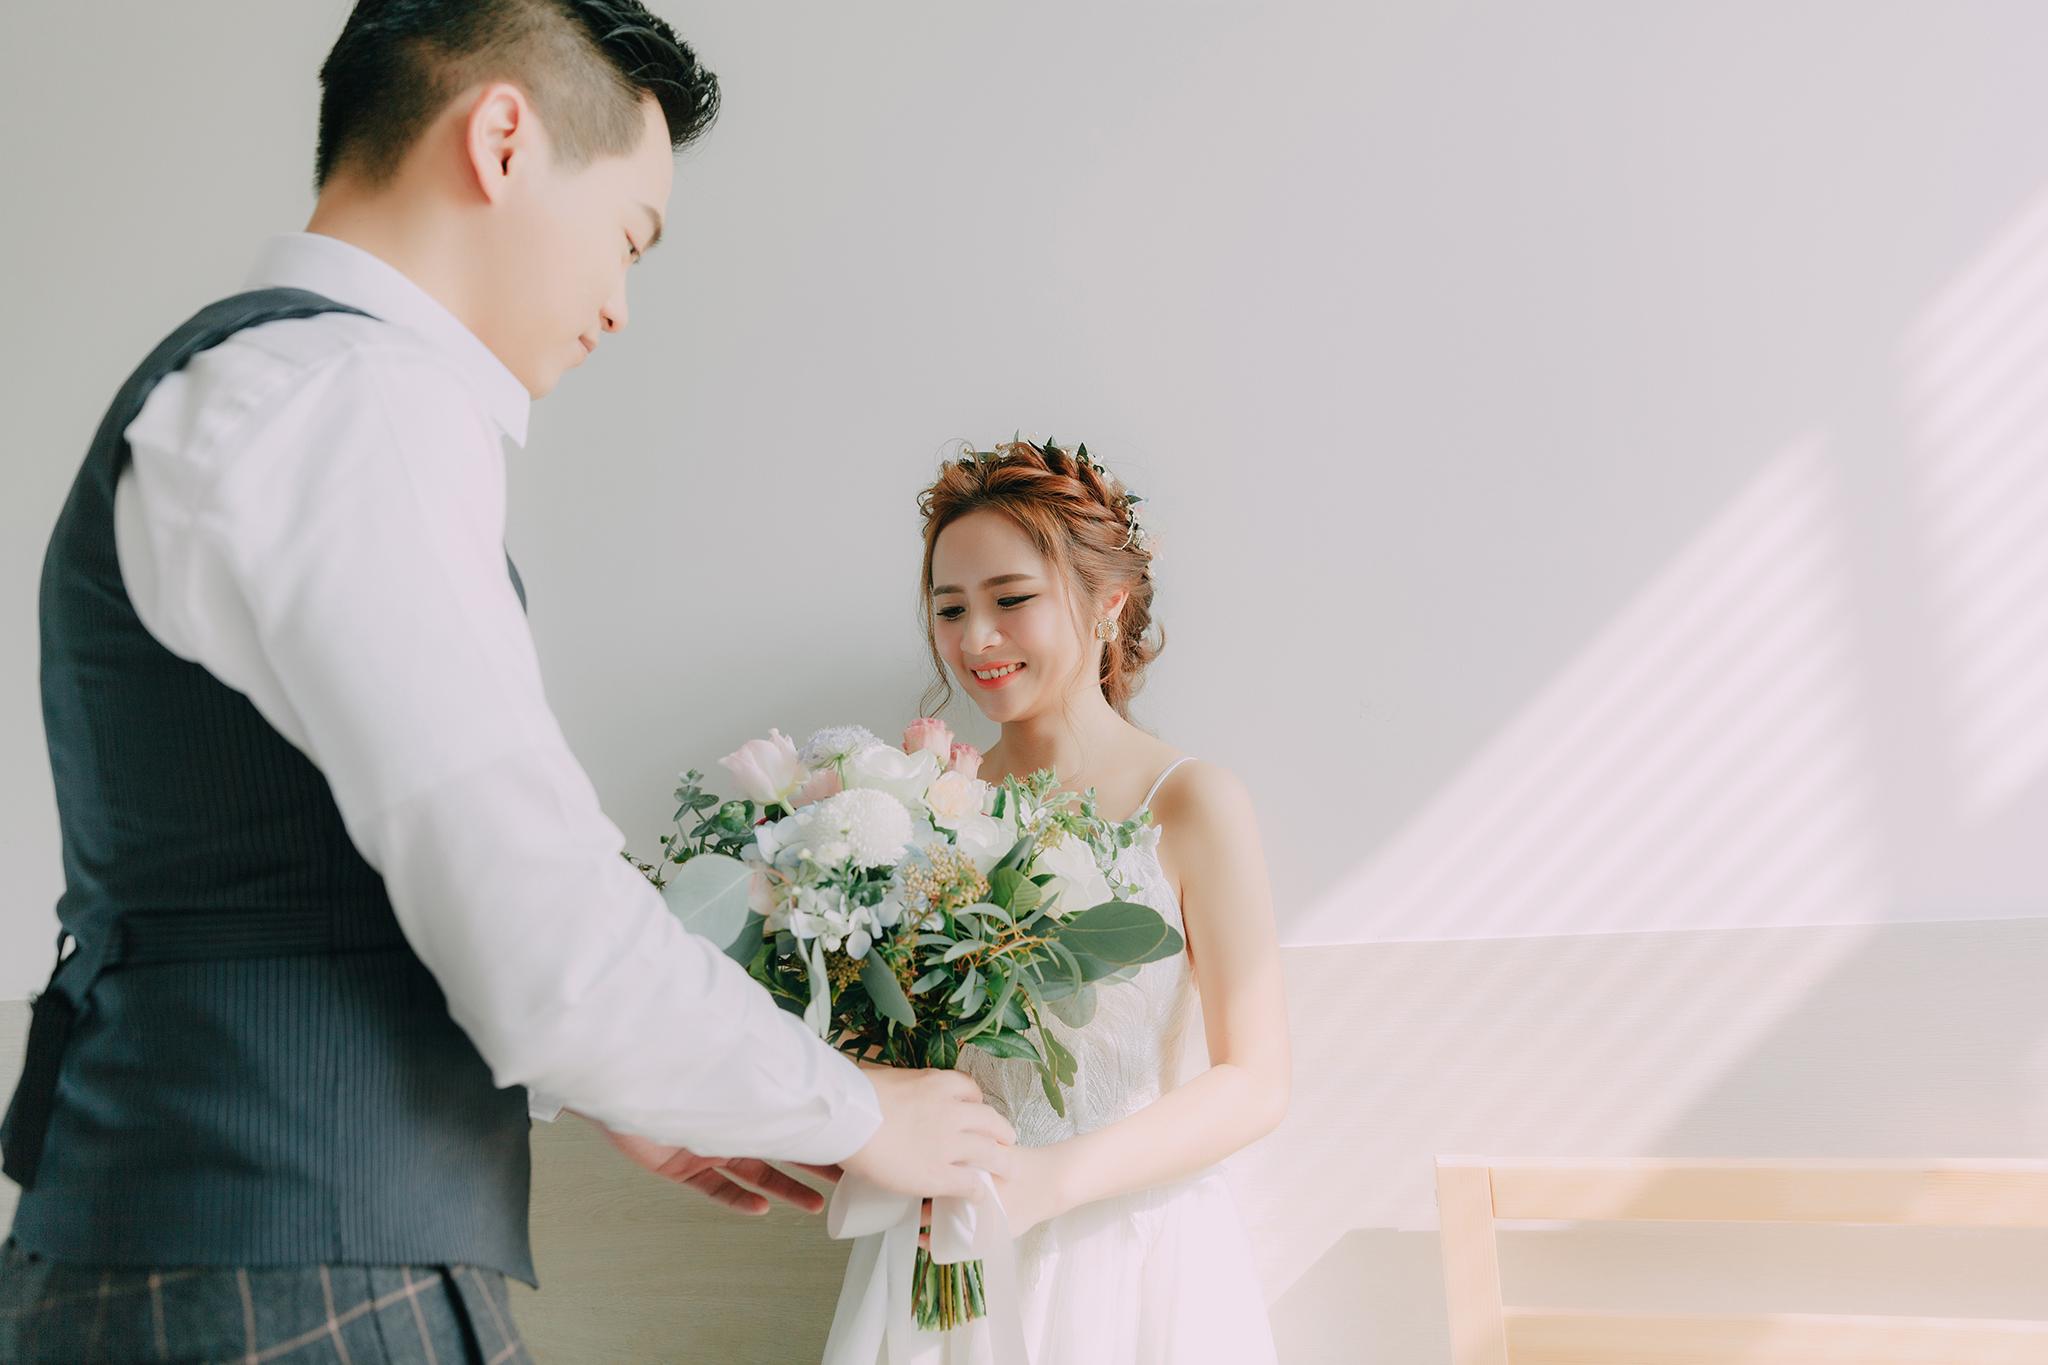 46178849365 1fbd9317d9 o - 【自助婚紗】+至宏&如蕙+